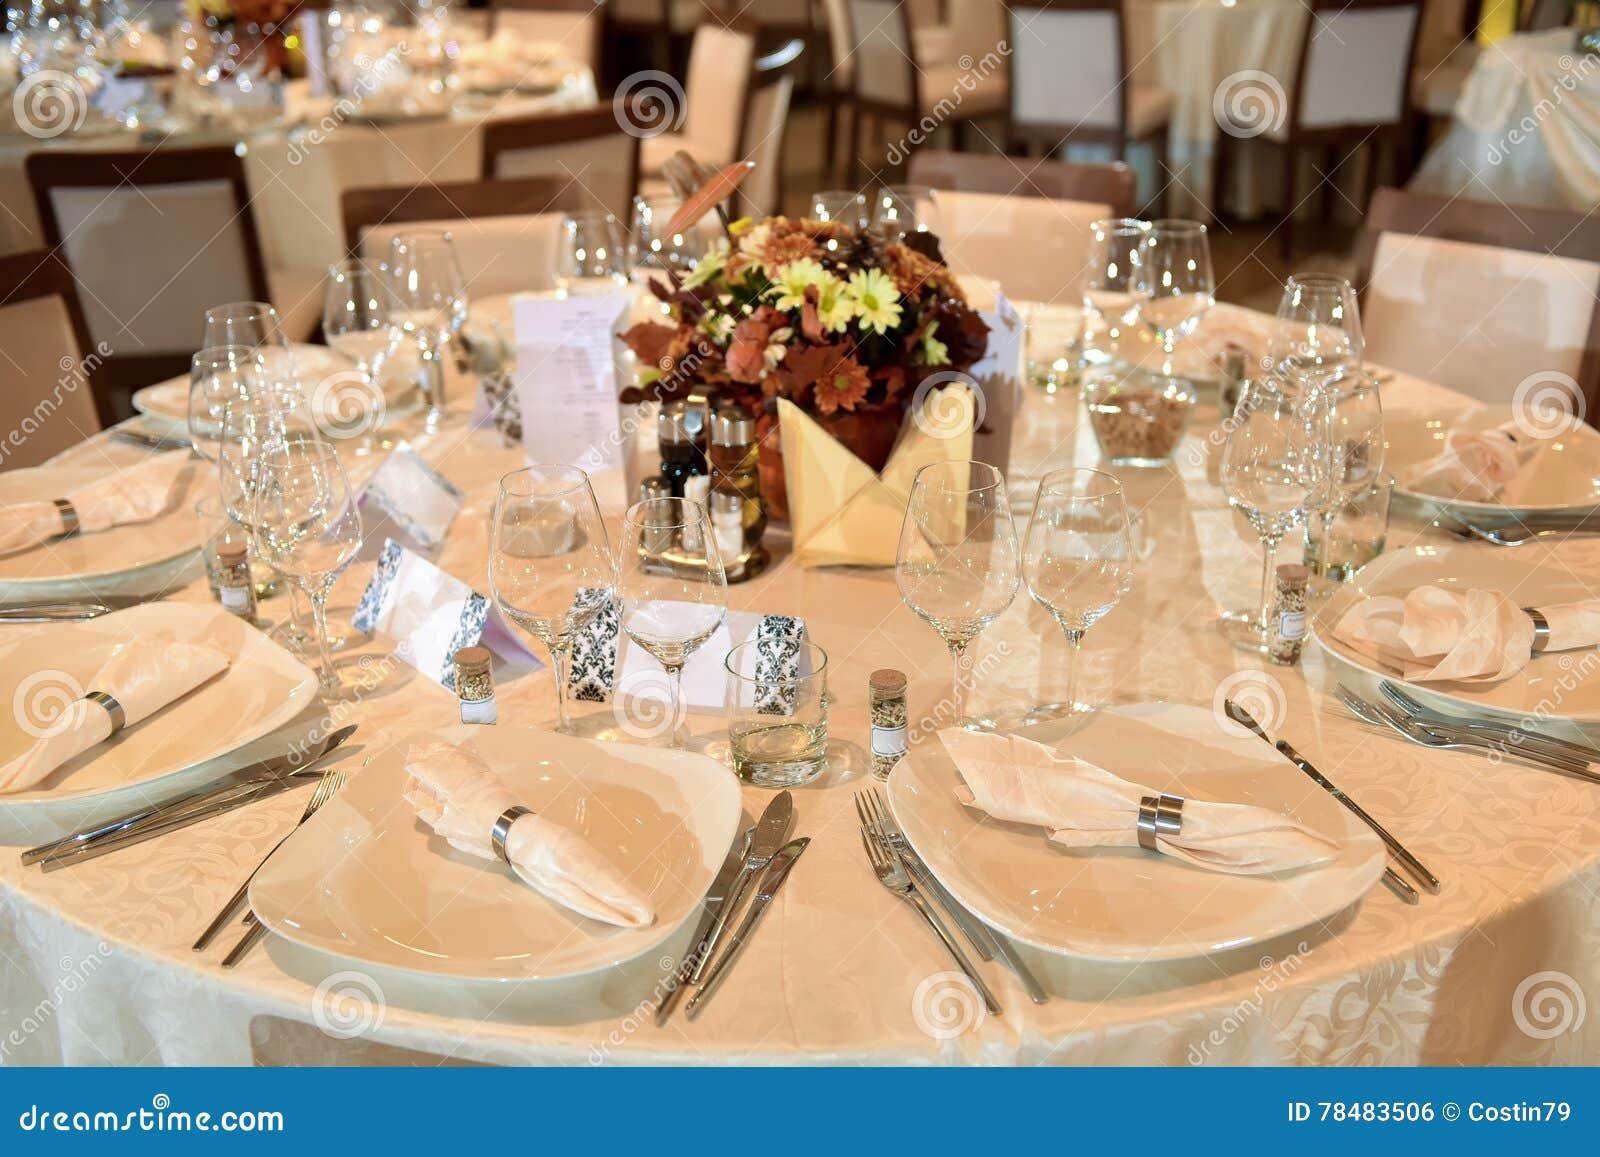 Setup wedding table stock photo. Image of dining, romantic   78483506